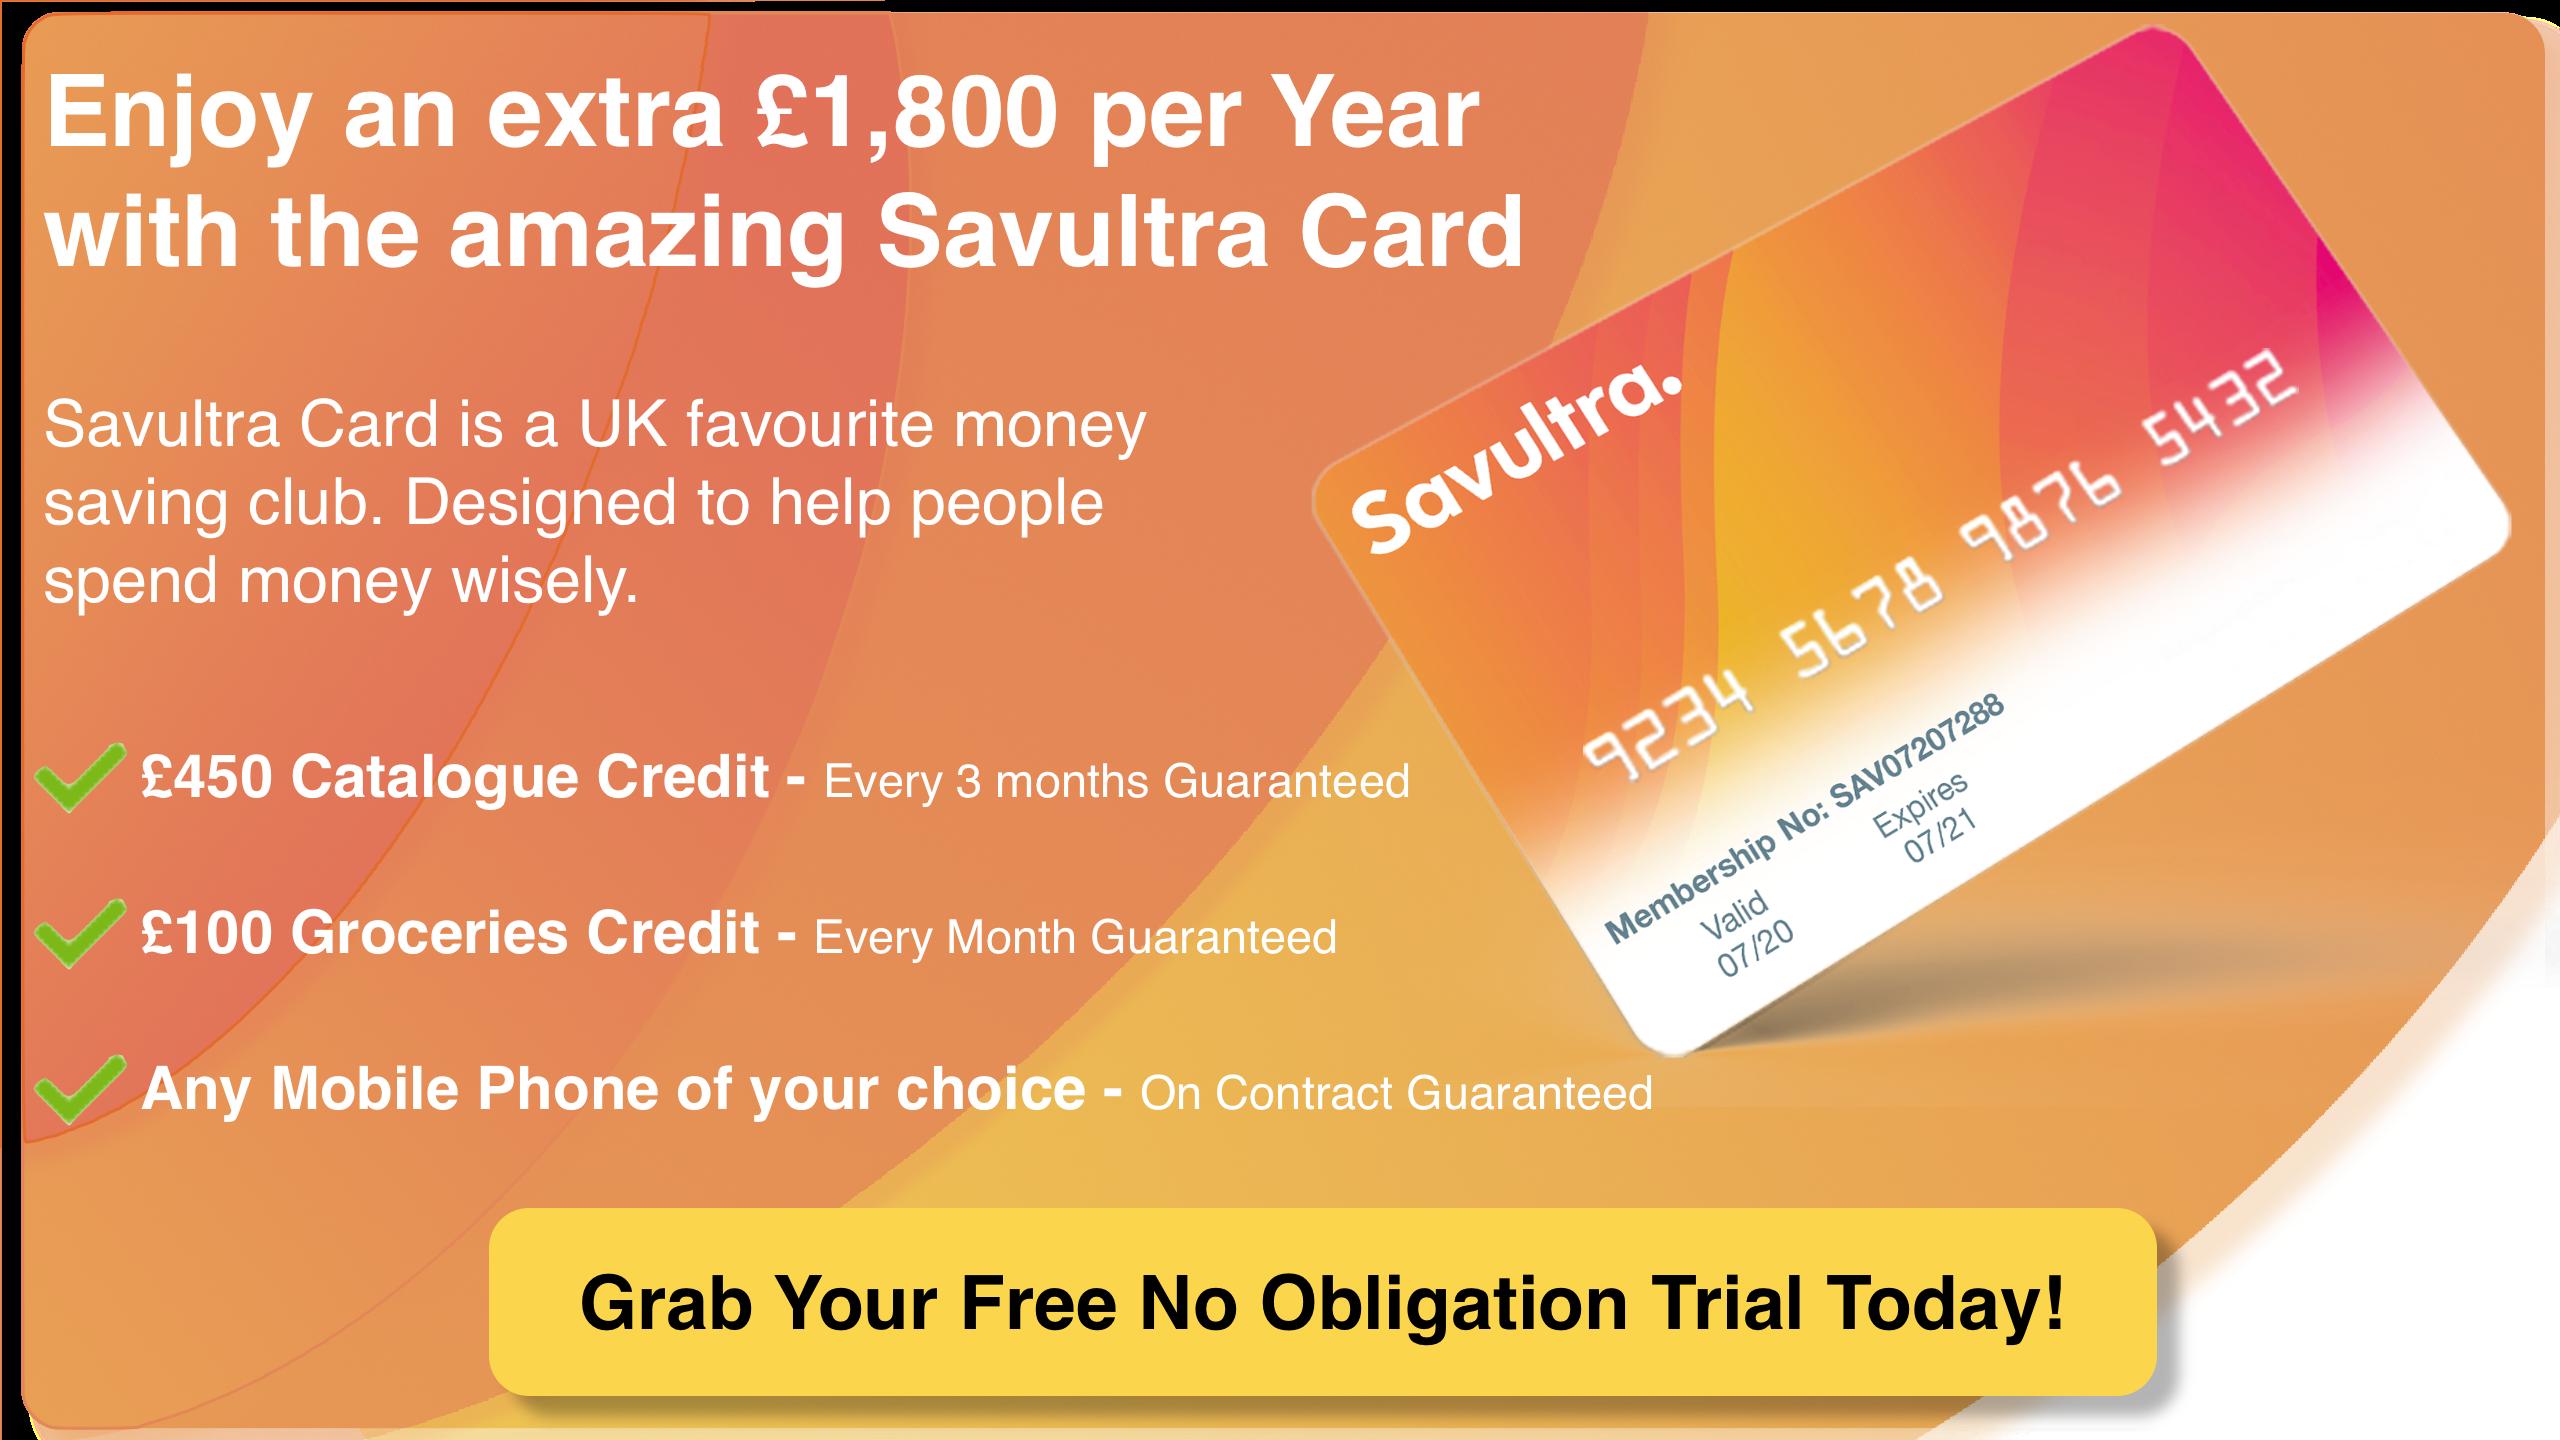 Savultra Card